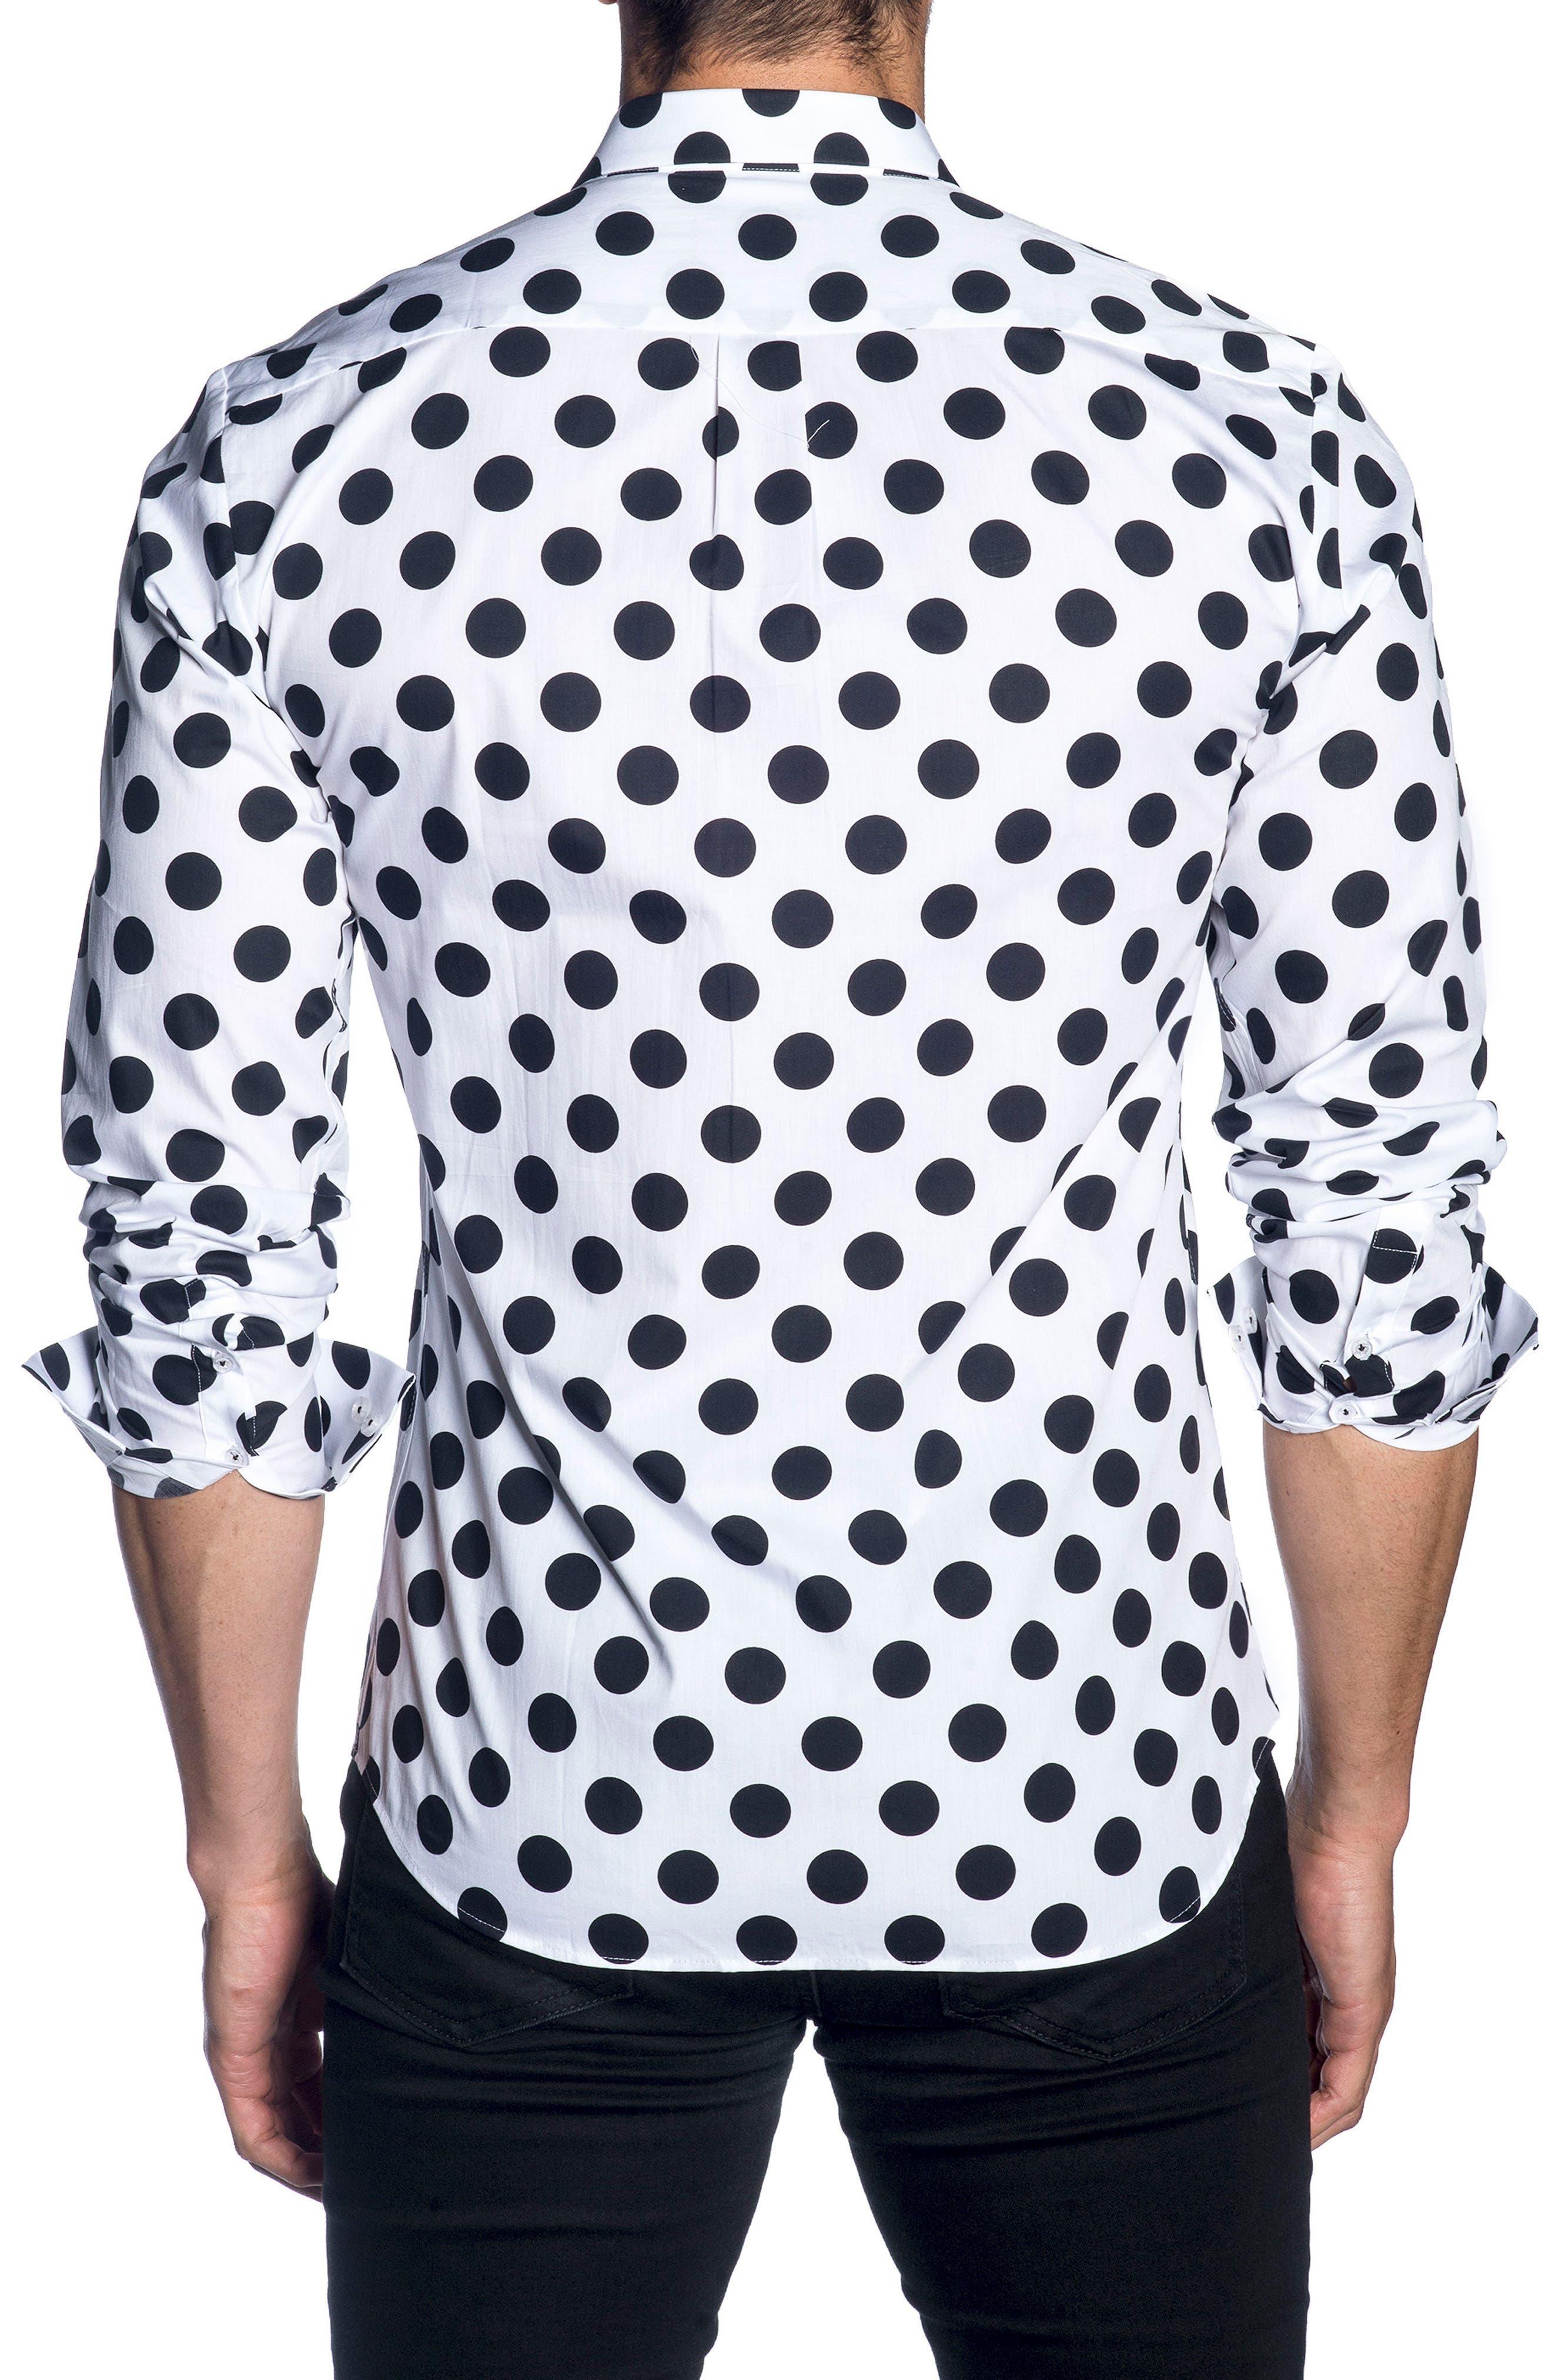 Trim Fit Sport Shirt,                             Alternate thumbnail 2, color,                             WHITE BLACK POLKA DOT